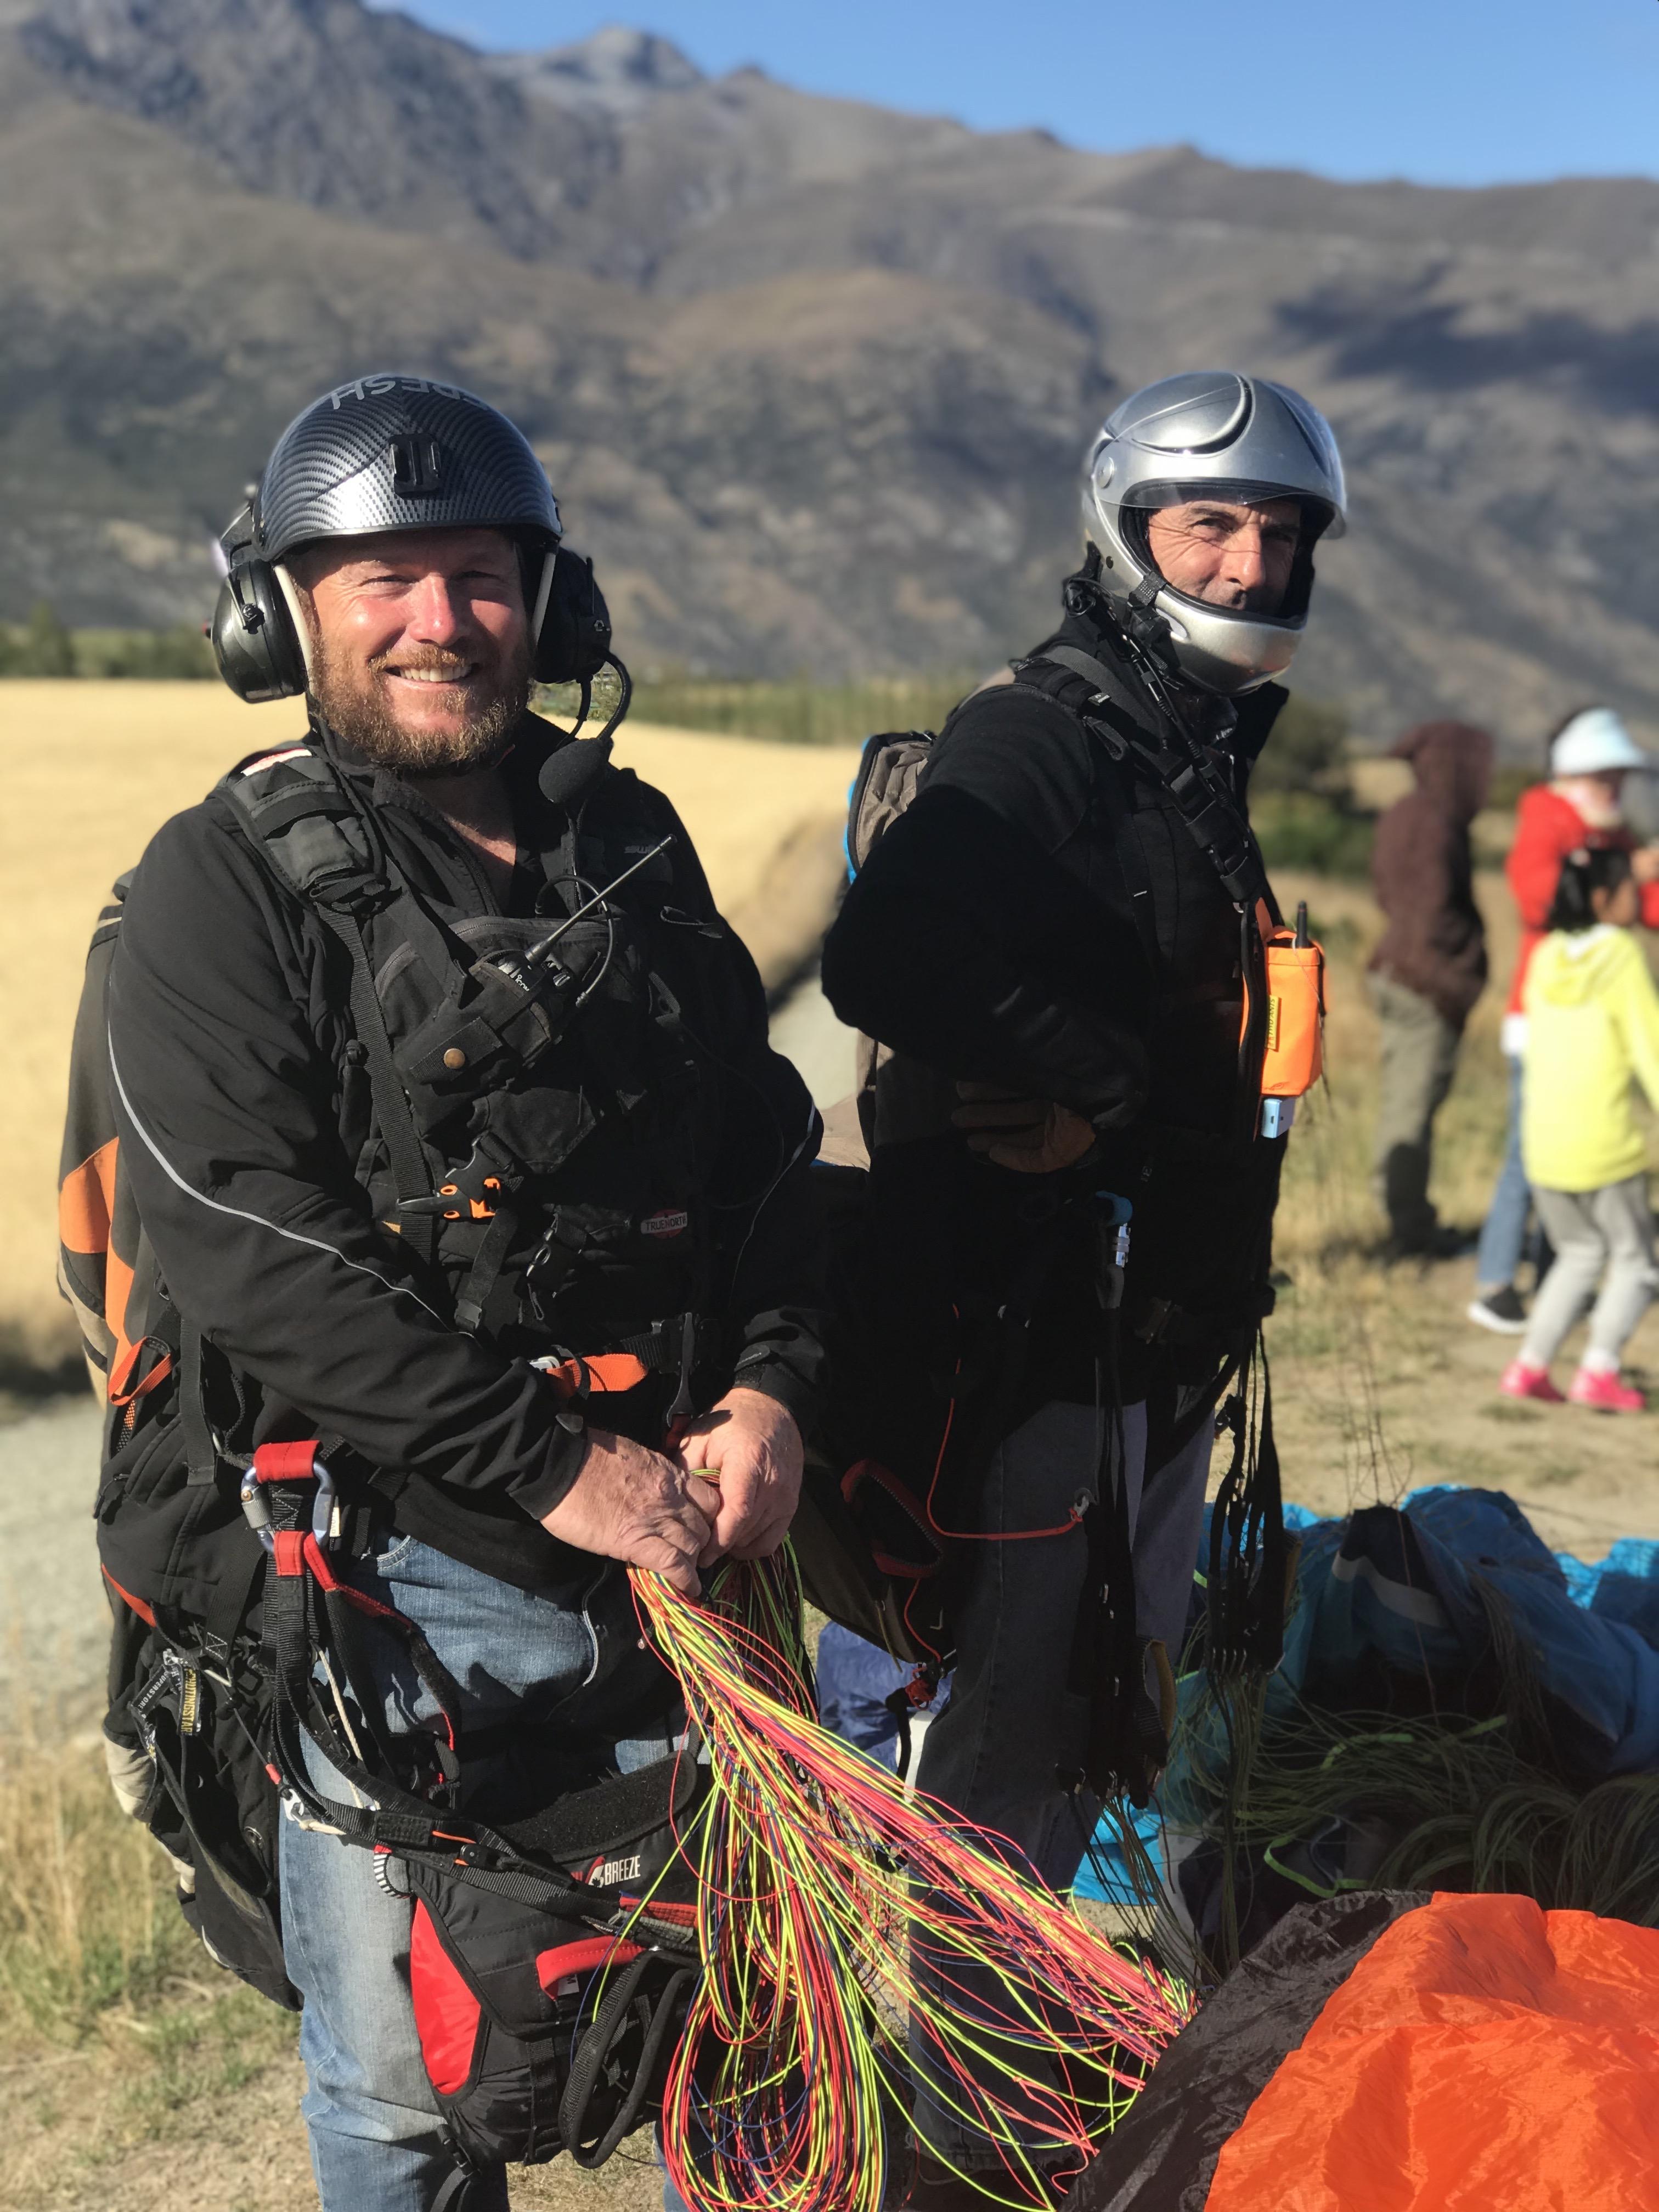 Southern Alps paragliding tour